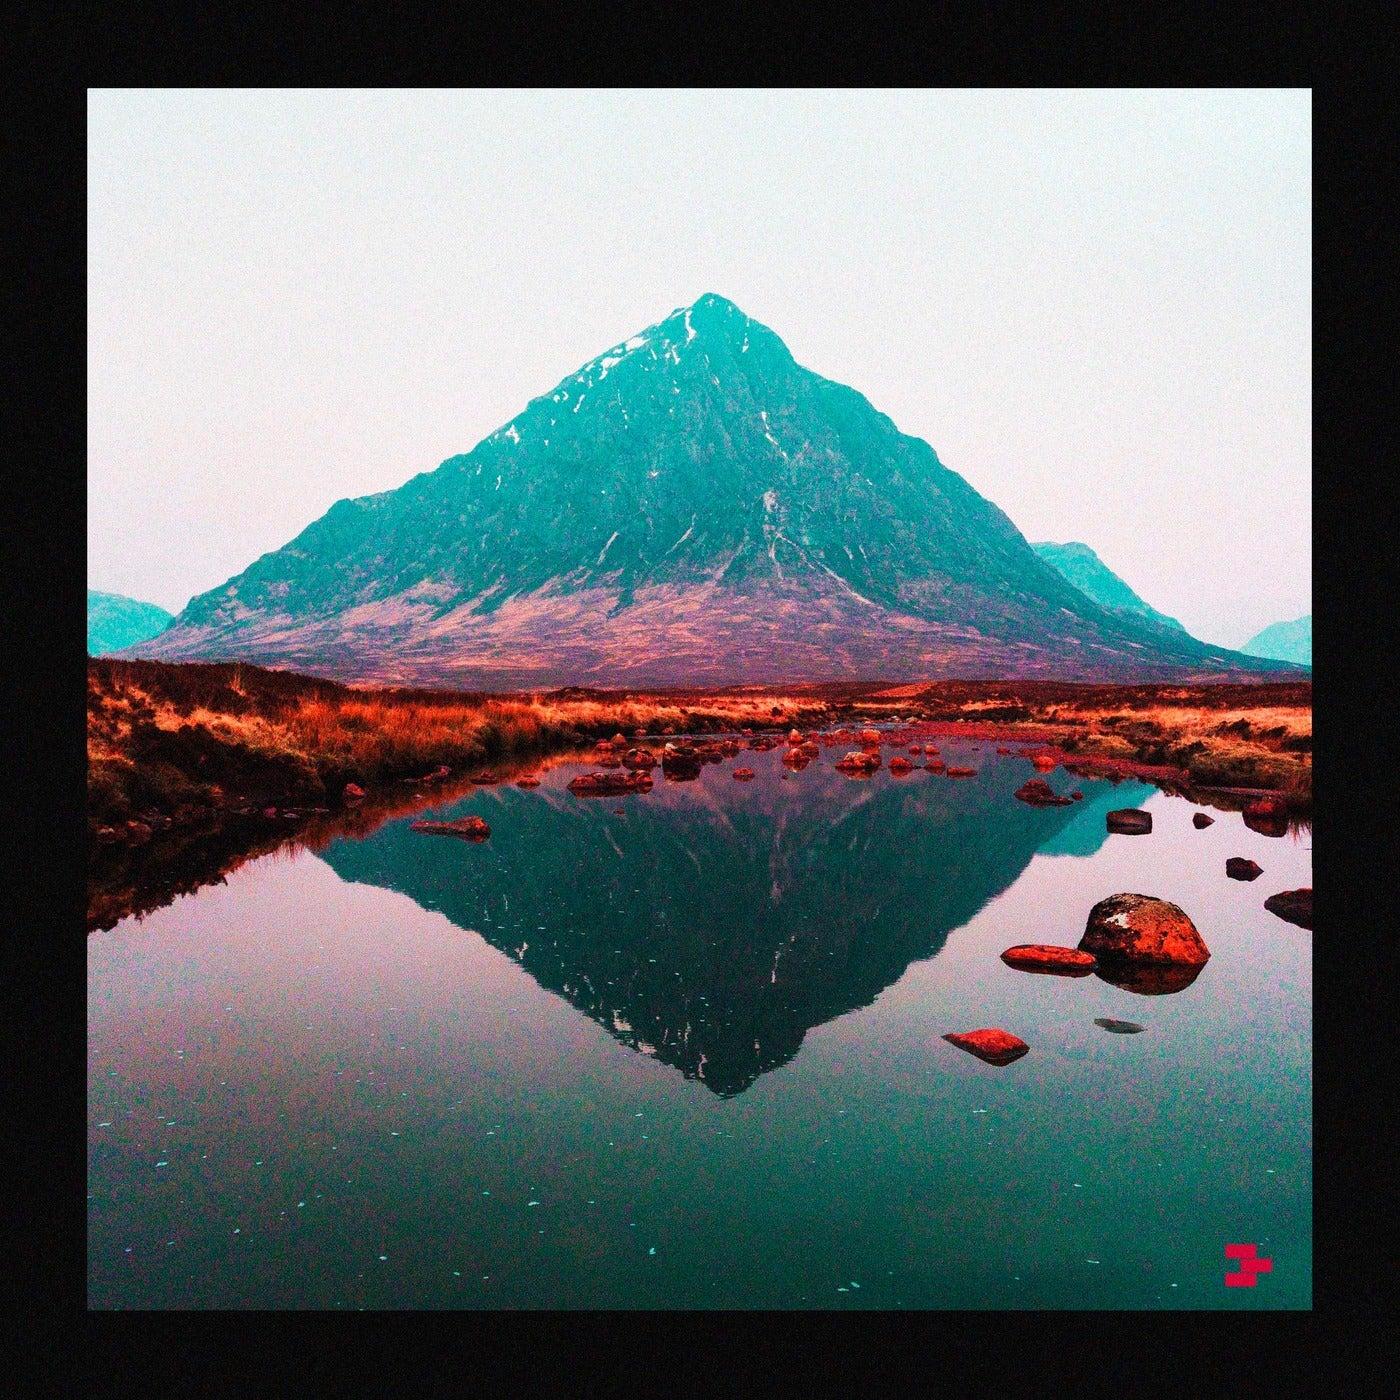 Syncro (Original Mix)